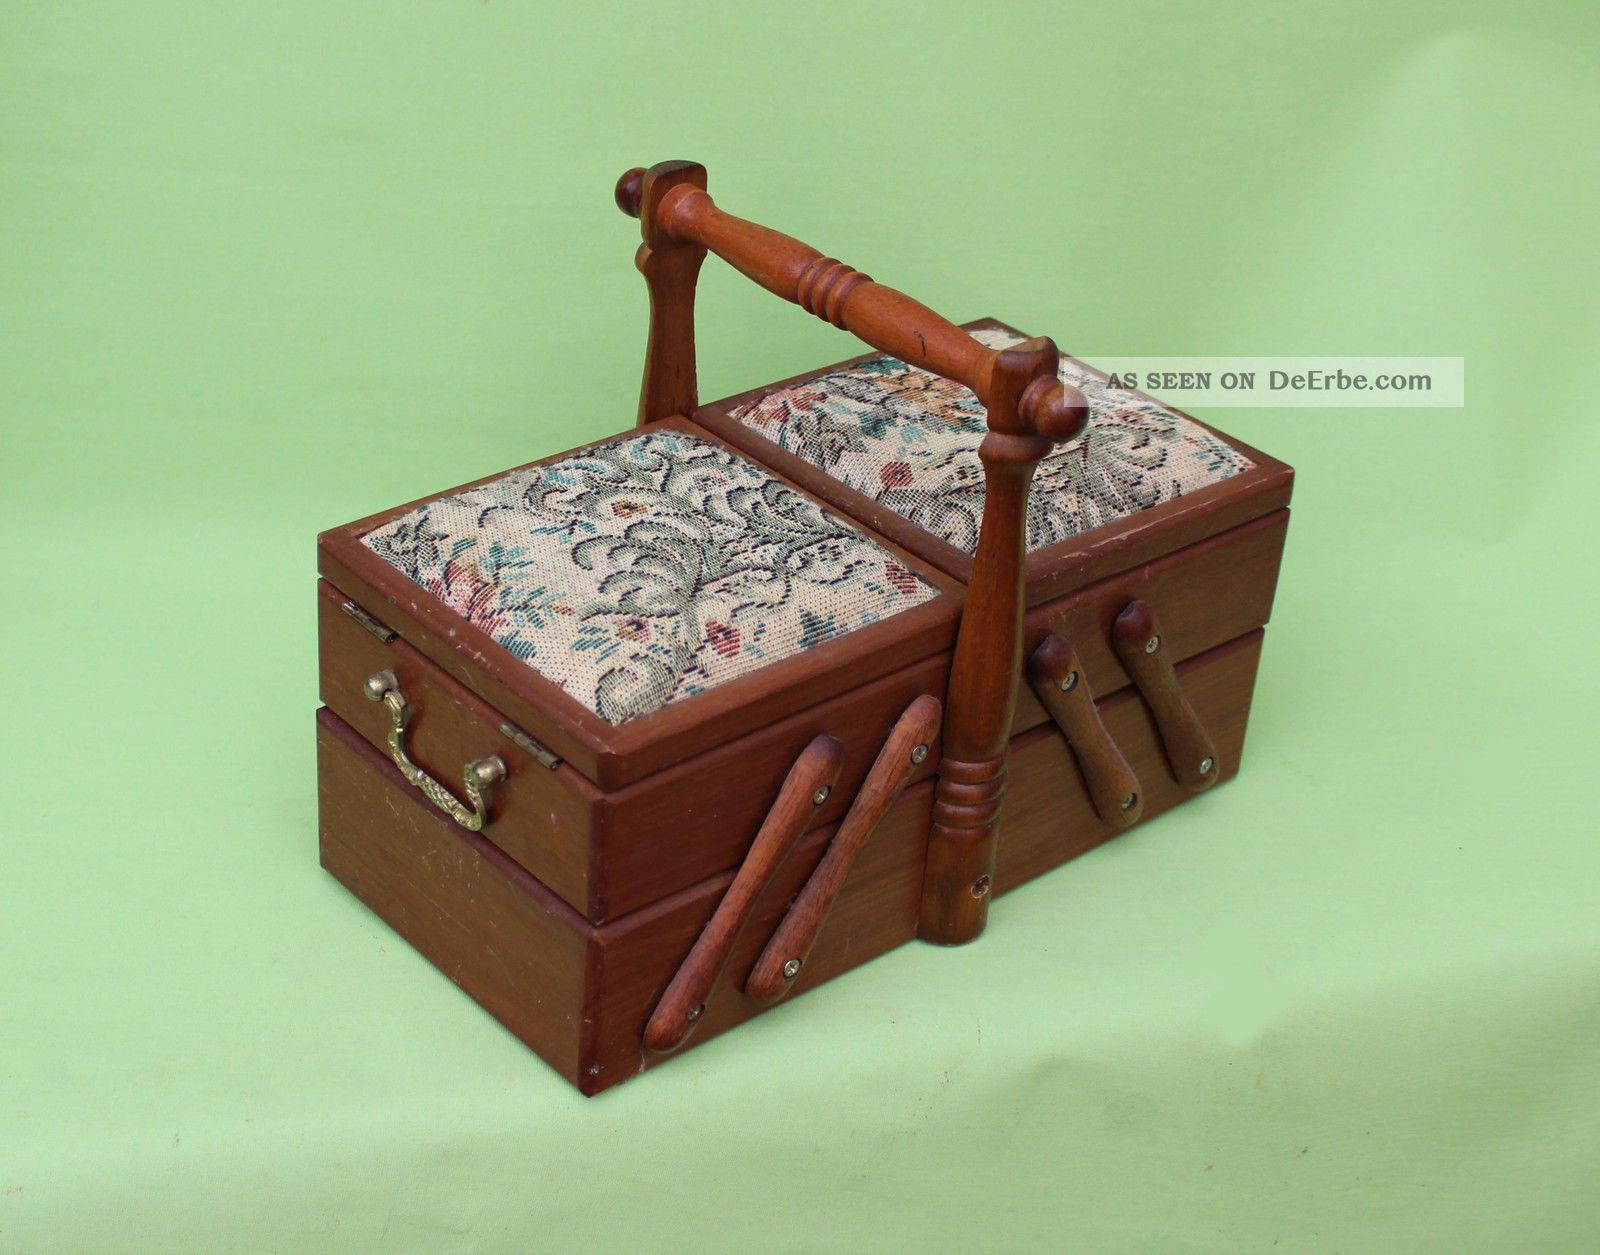 antikes holz n hk stchen deckel als nadelkissen gobelin sehr selten. Black Bedroom Furniture Sets. Home Design Ideas